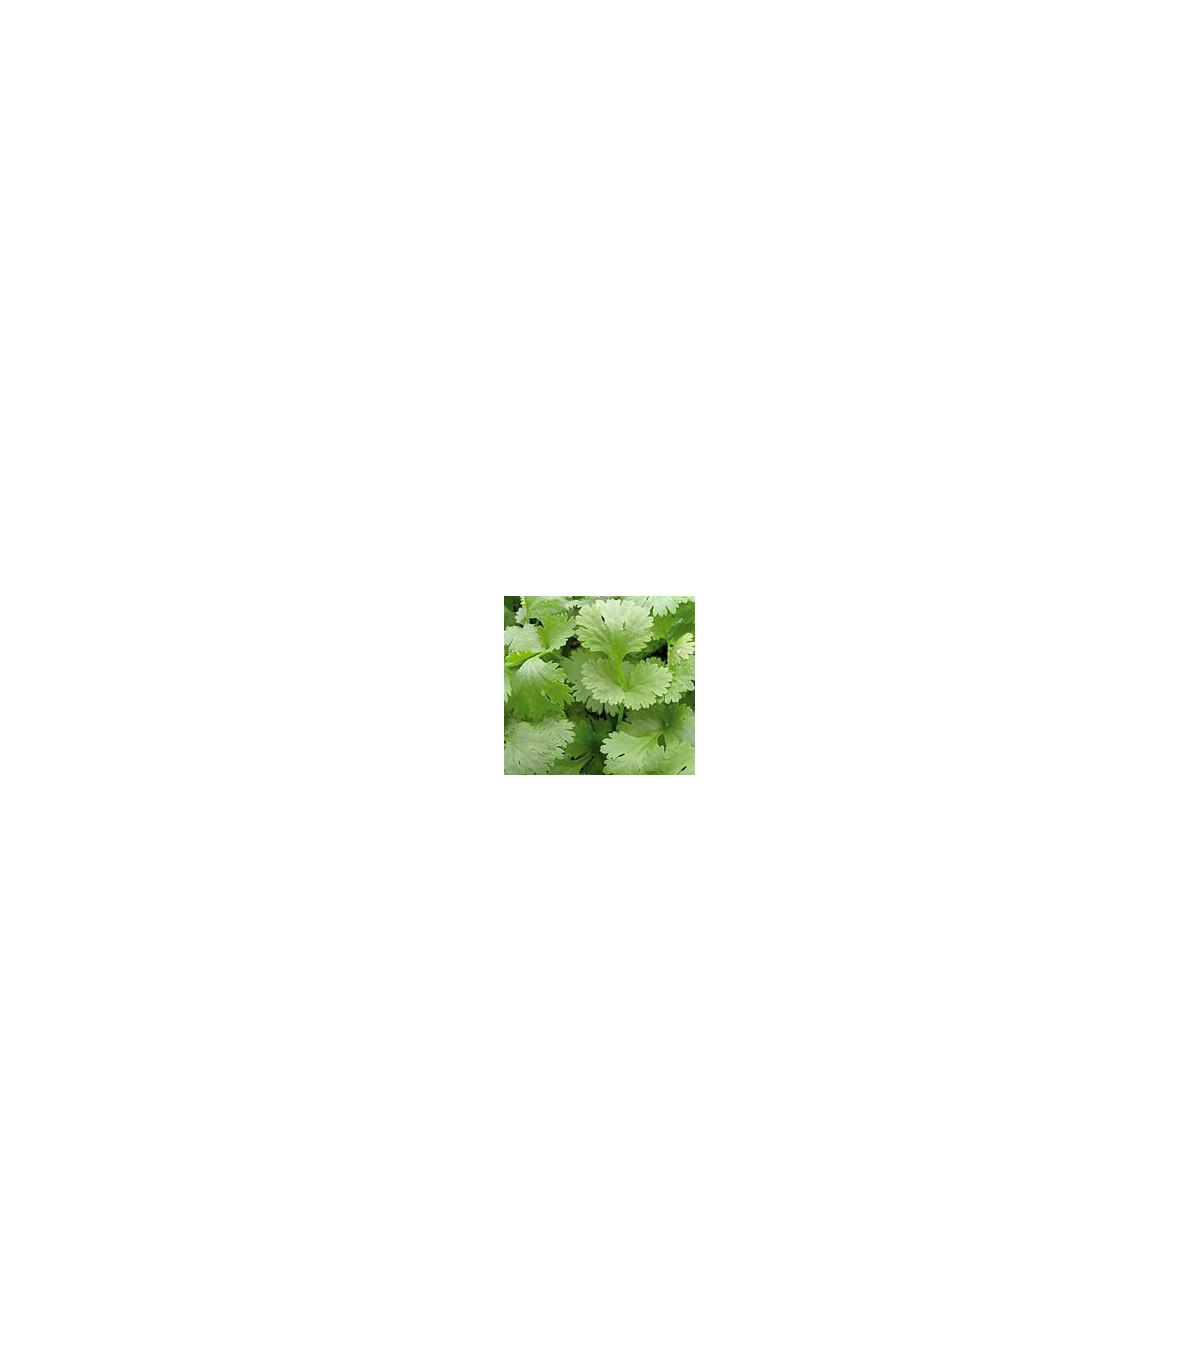 Koriandr setý Chechnya - semena Koriandru - Coriandrum sativum - 100 ks